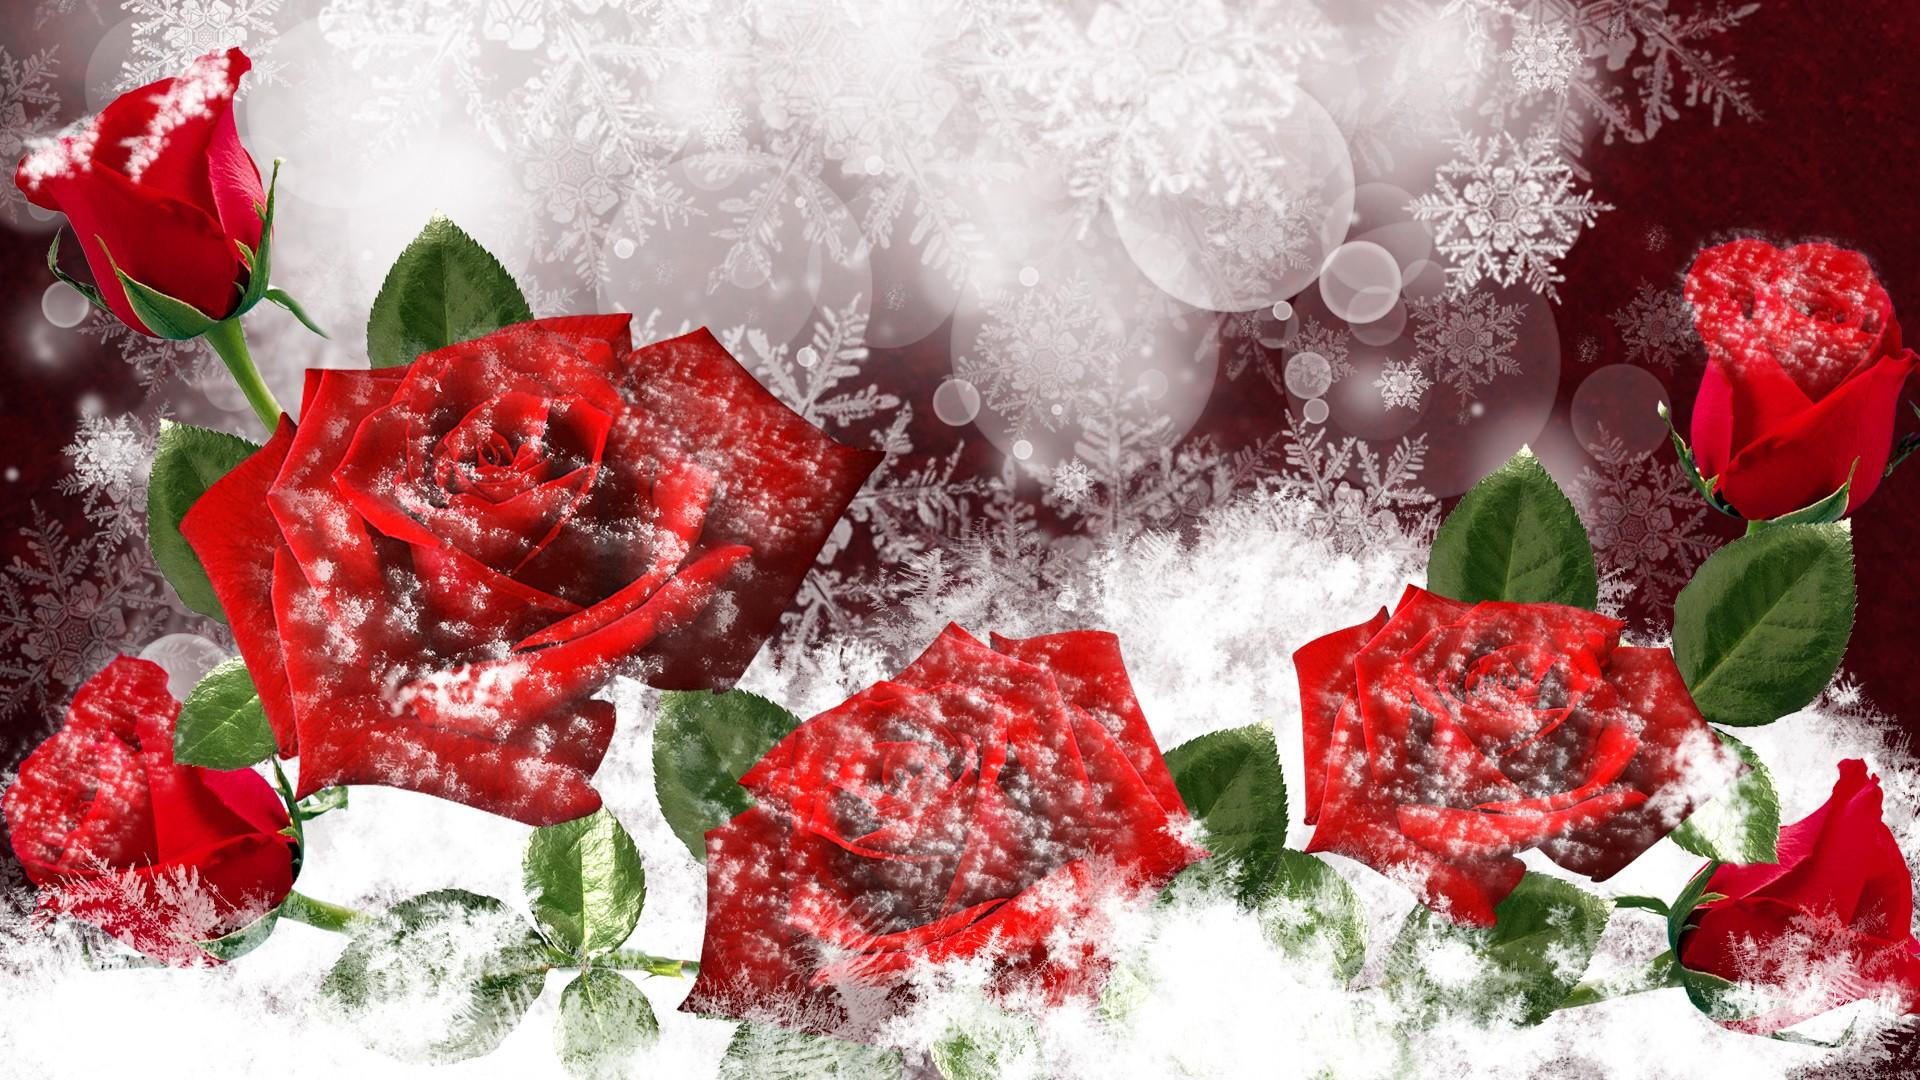 Wonderful red frozen roses hd winter wallpaper - Rose in snow wallpaper ...